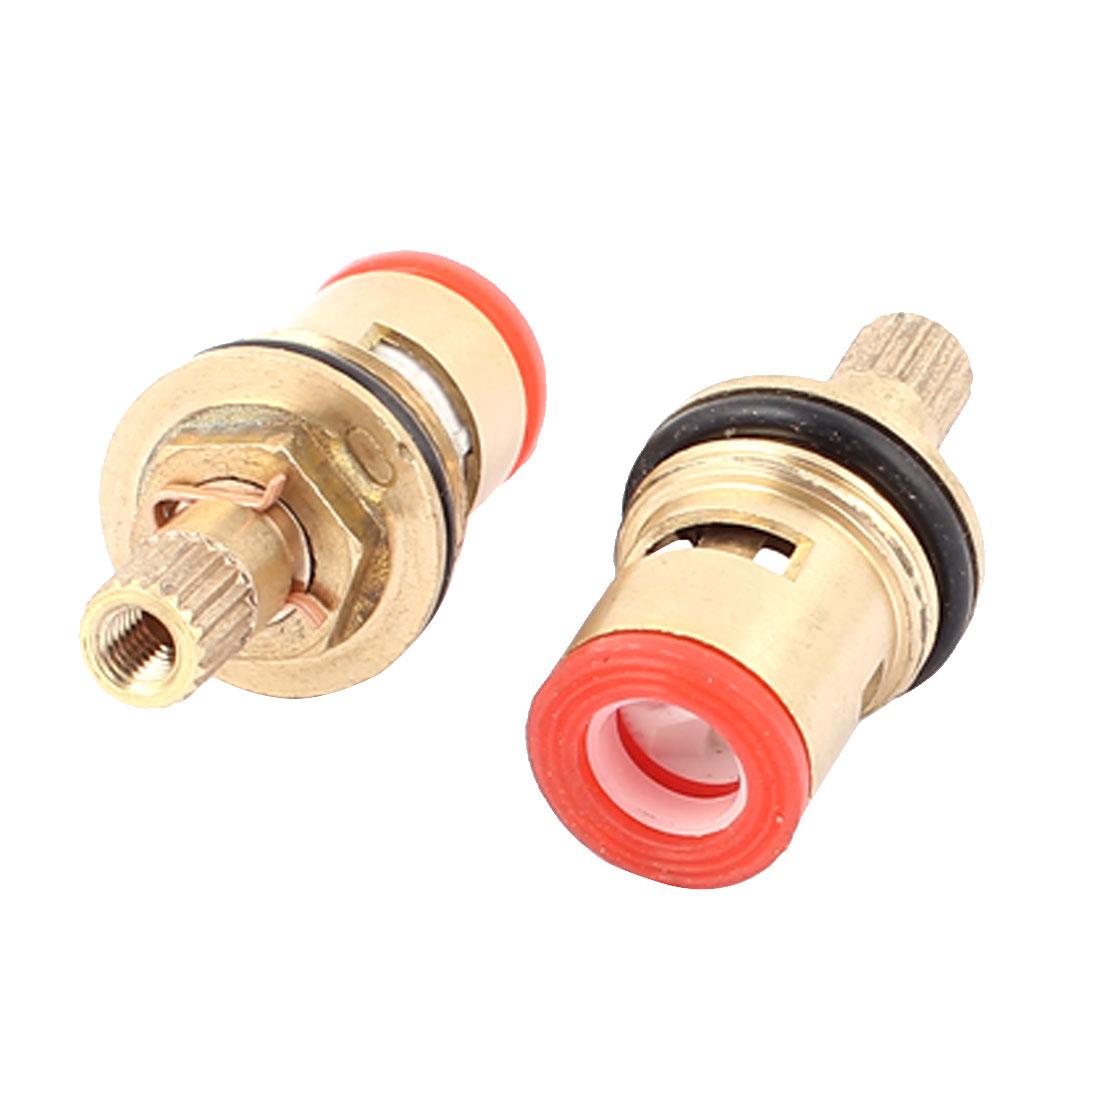 Kitchen Bathroom Brass Fitting Faucet Cartridge Valve 4mm Nozzle Thread 2PCS